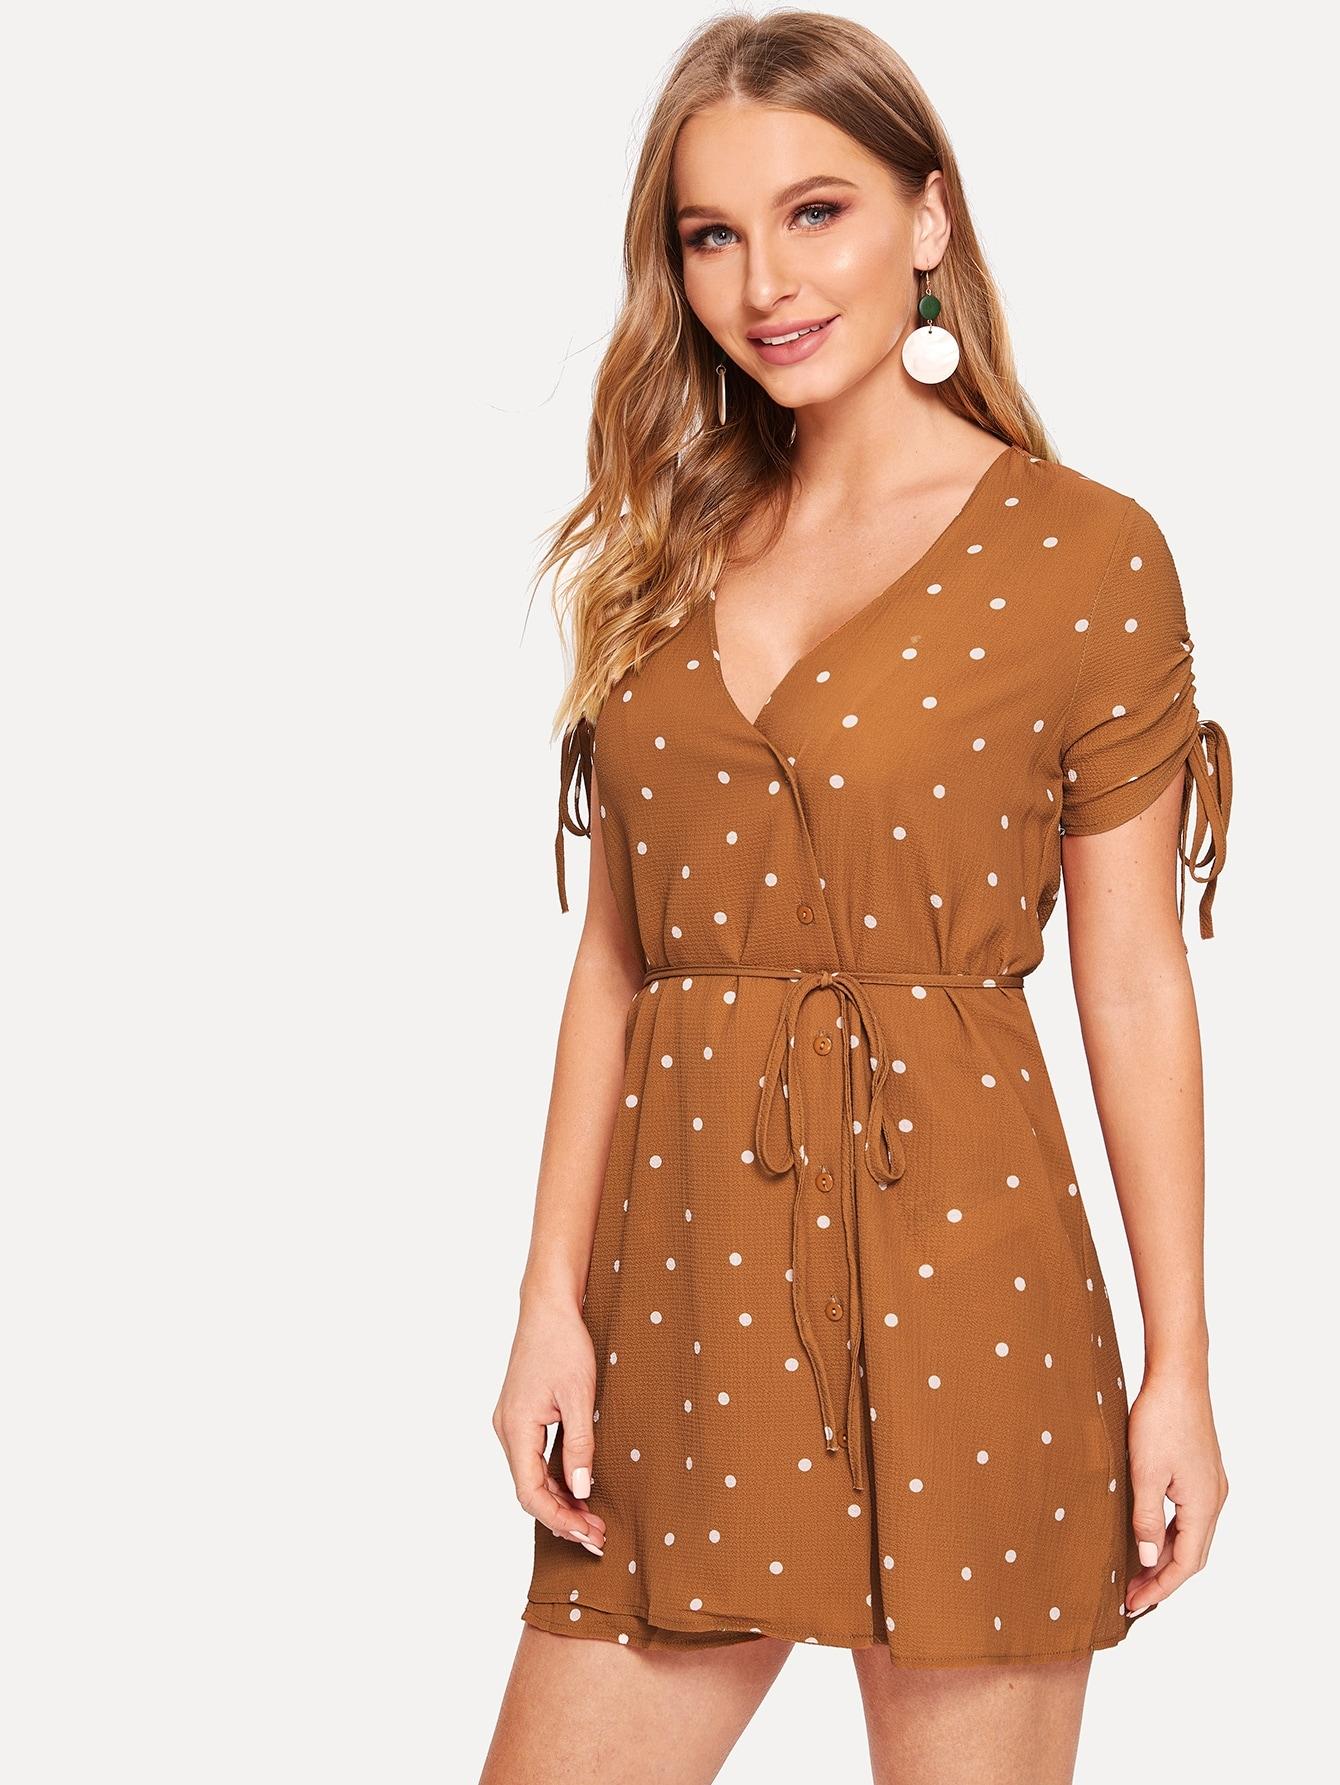 10e08870892 Polka Dot Print Drawstring Sleeve Dress - shein.com - imall.com